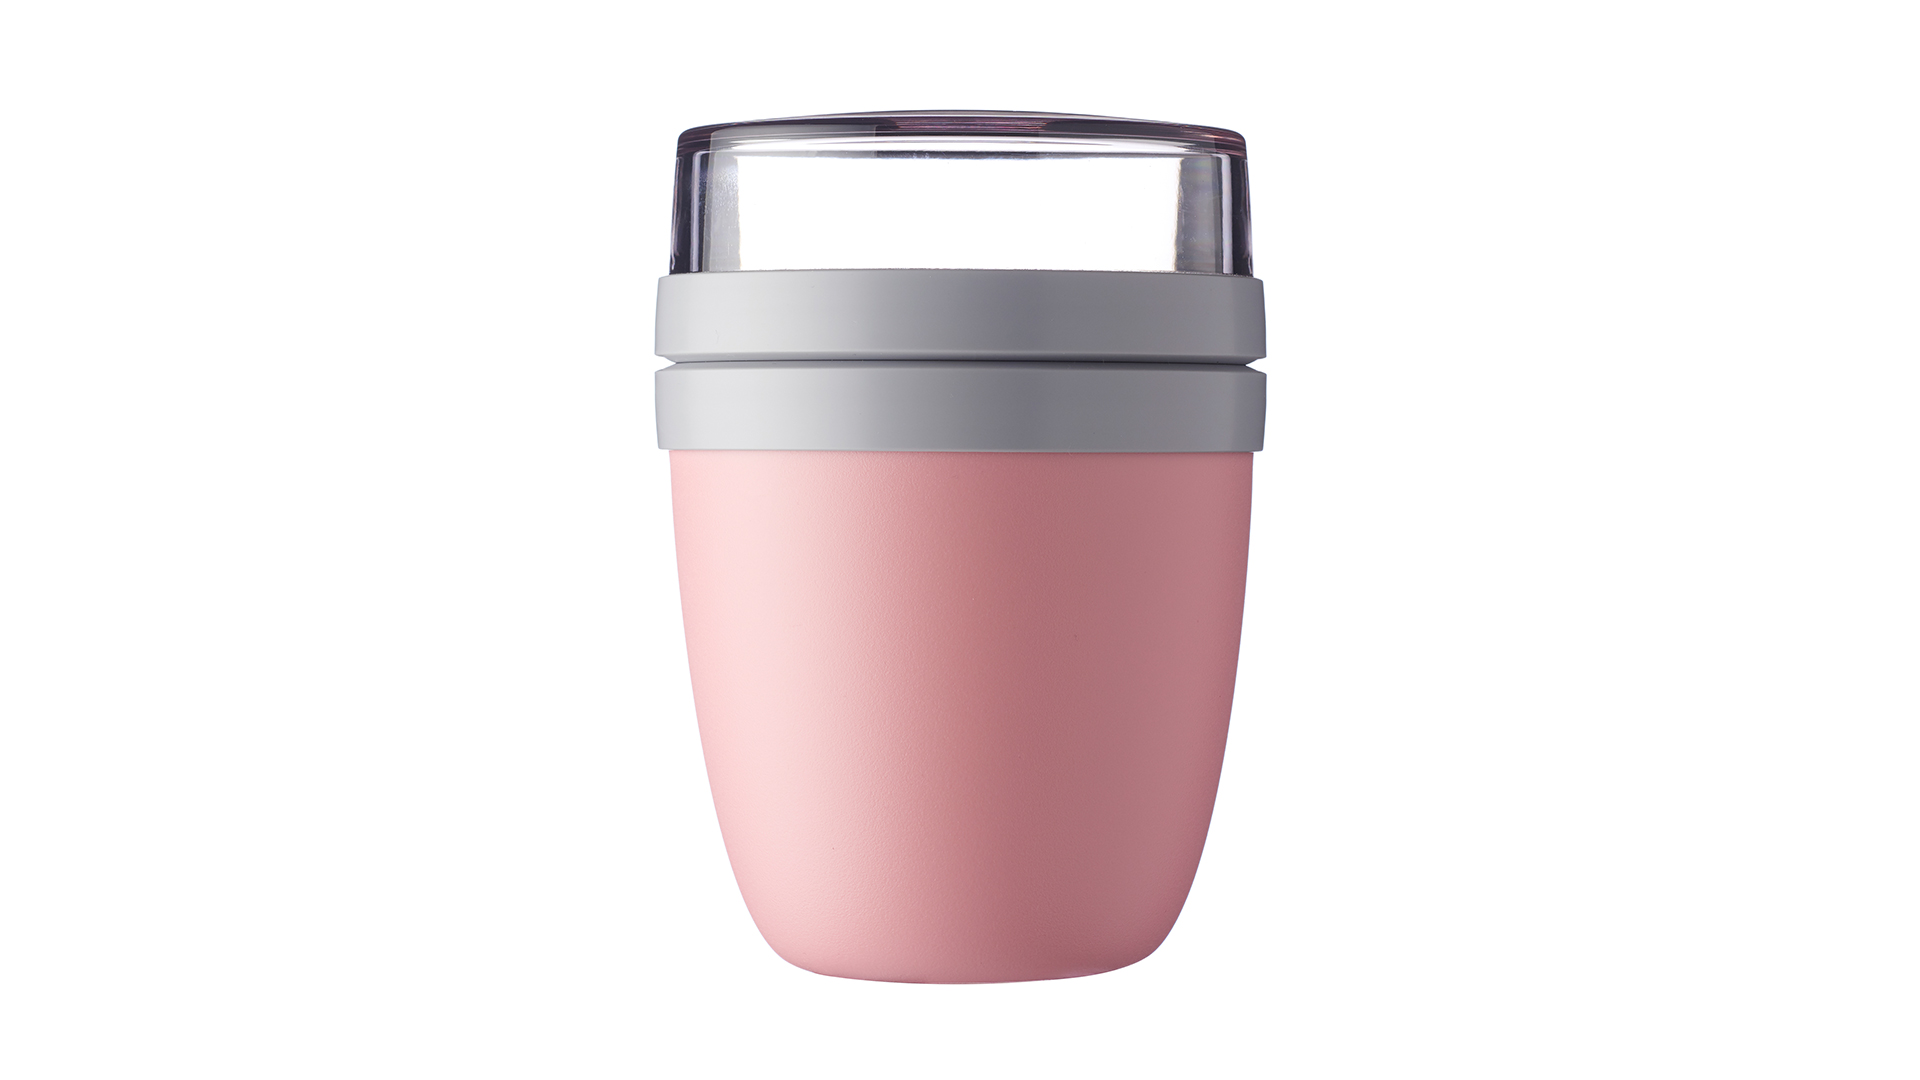 Кейс Mepal Ланч-бокс двухкамерный, розовый